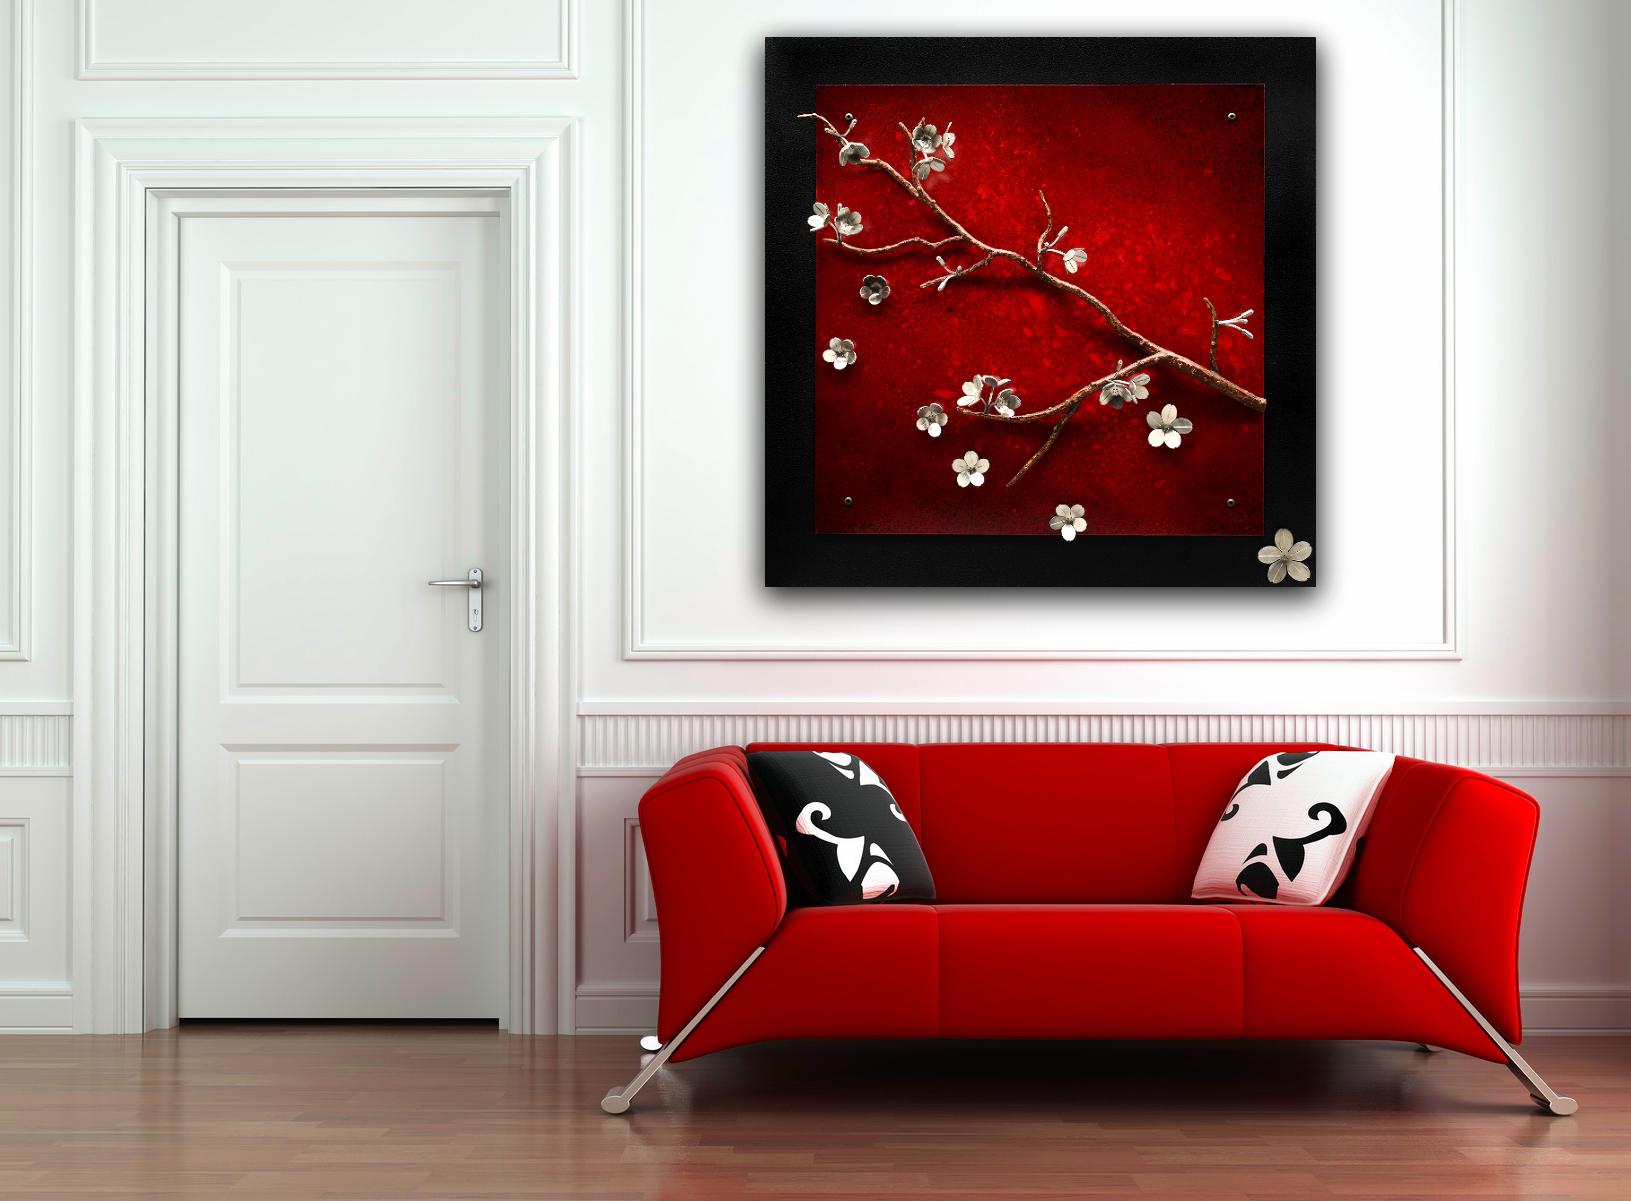 red and white interior.jpg